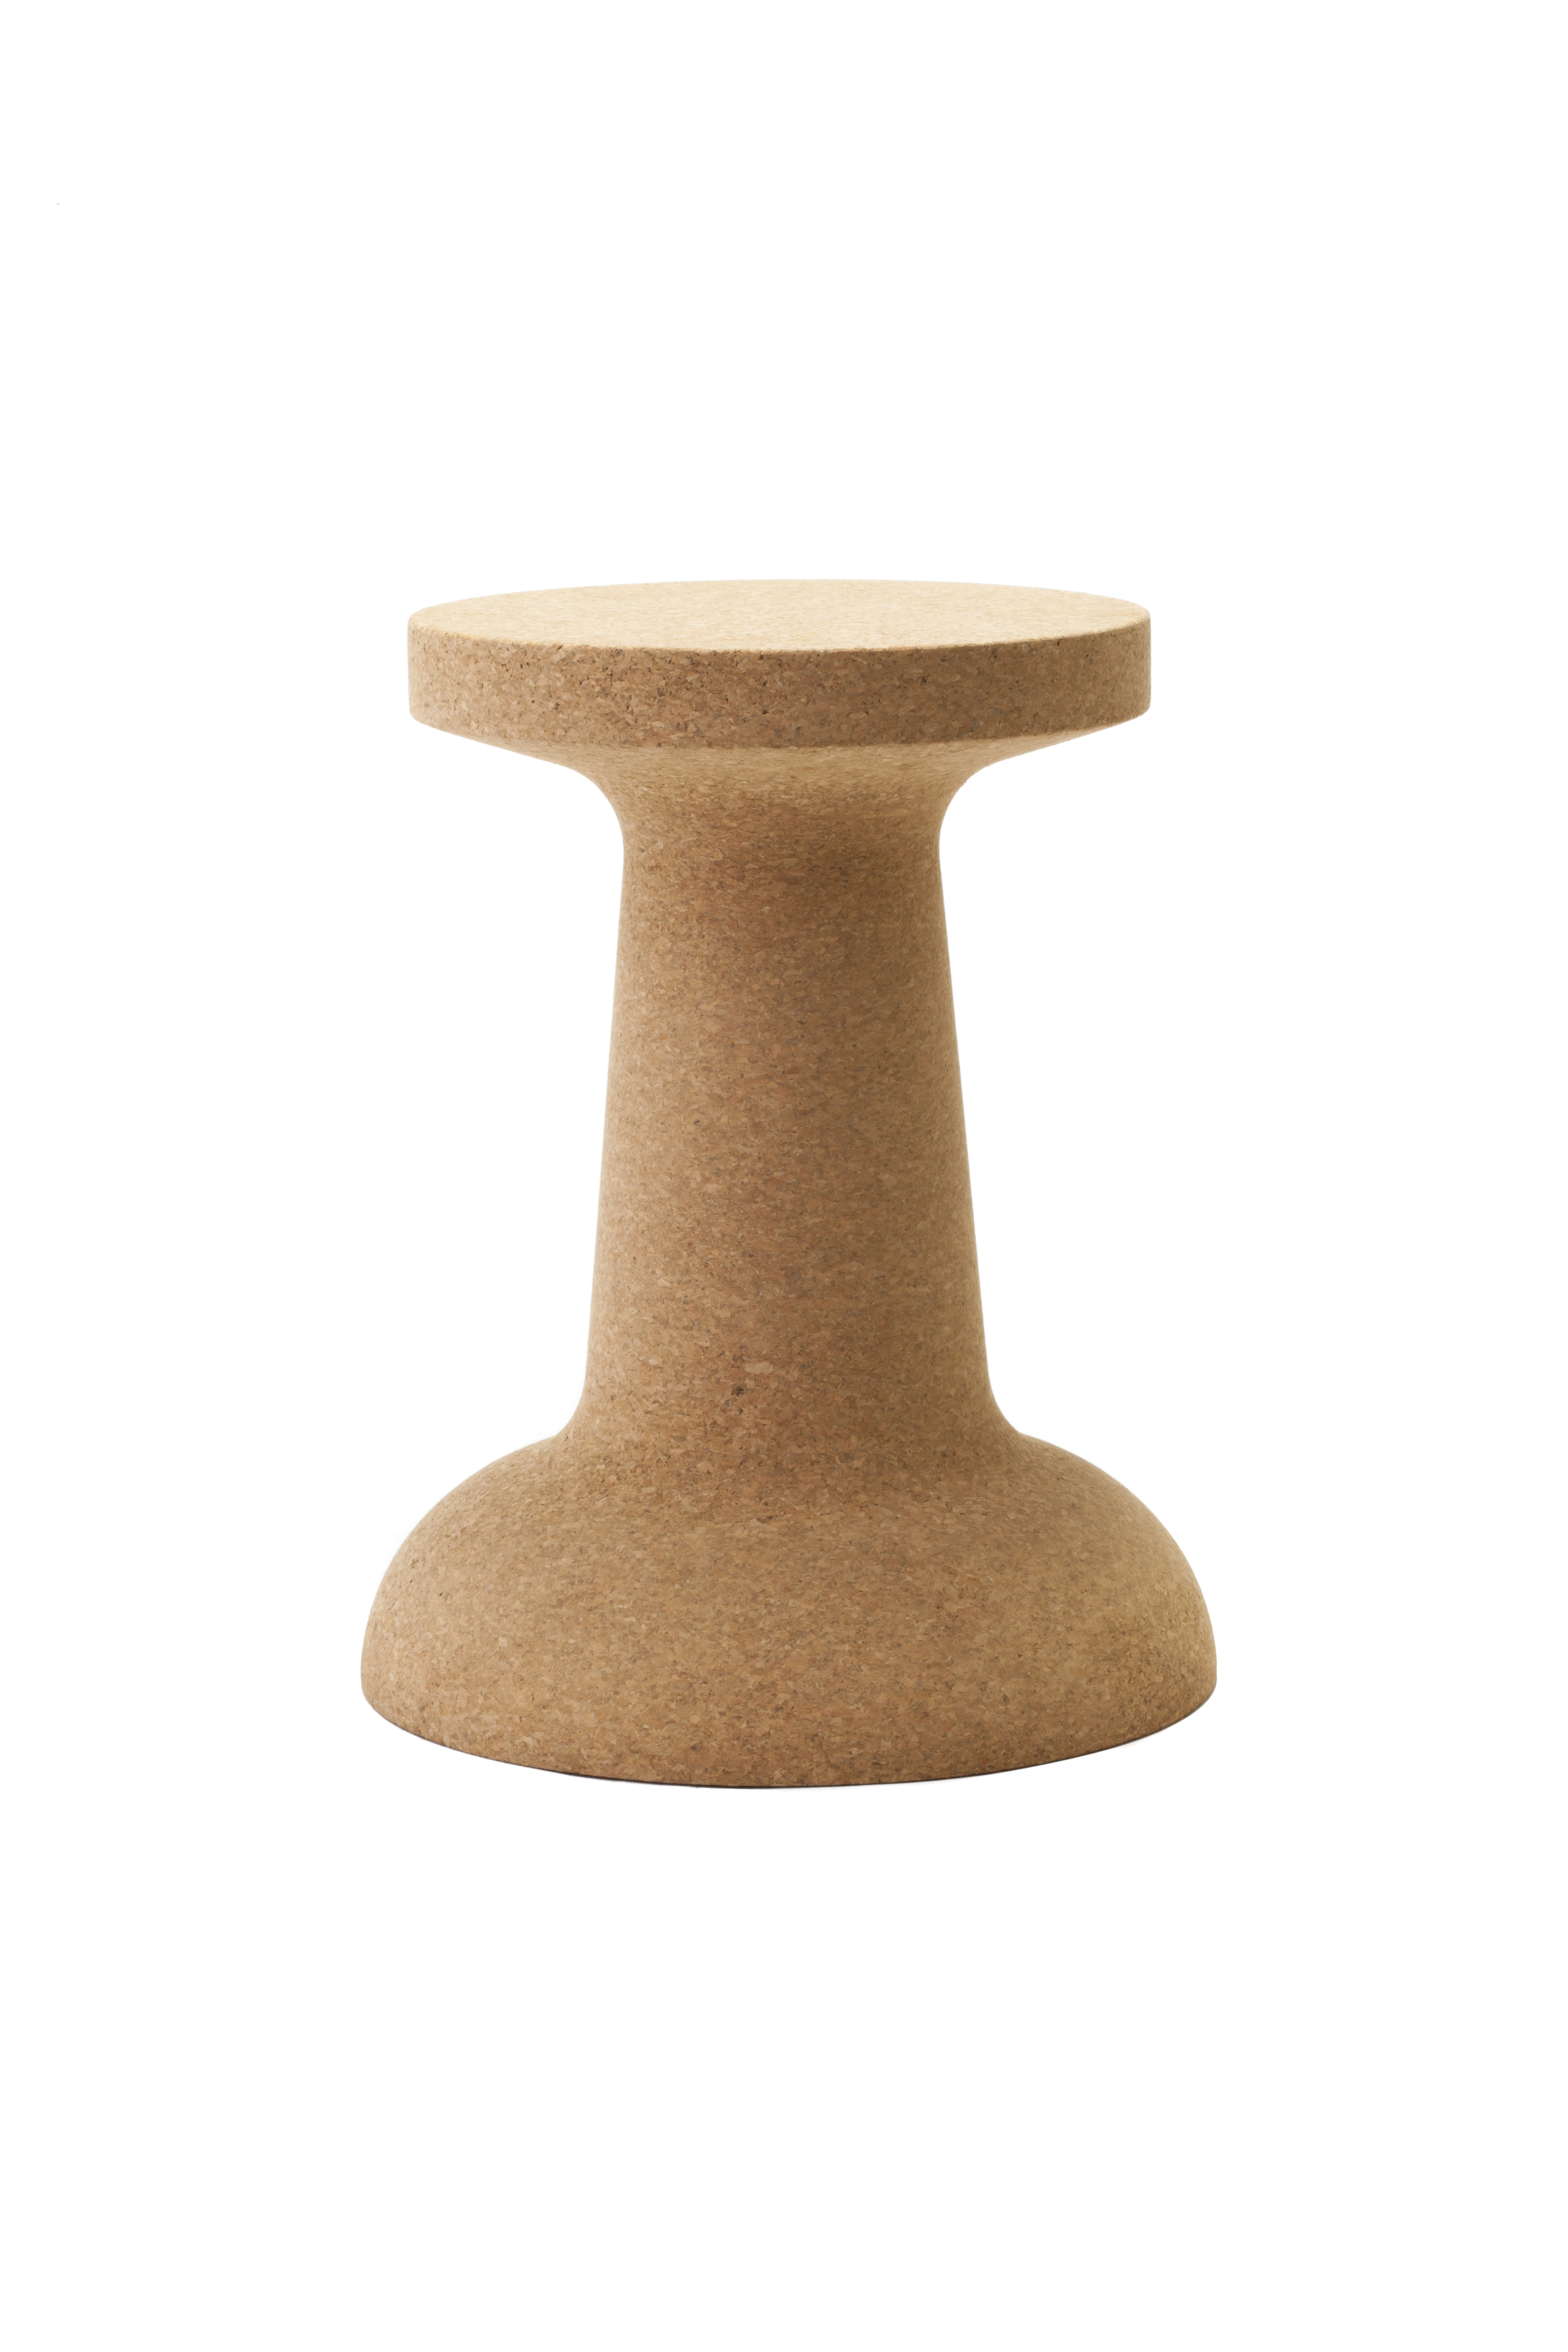 Esalia_Pushpin stool.jpg